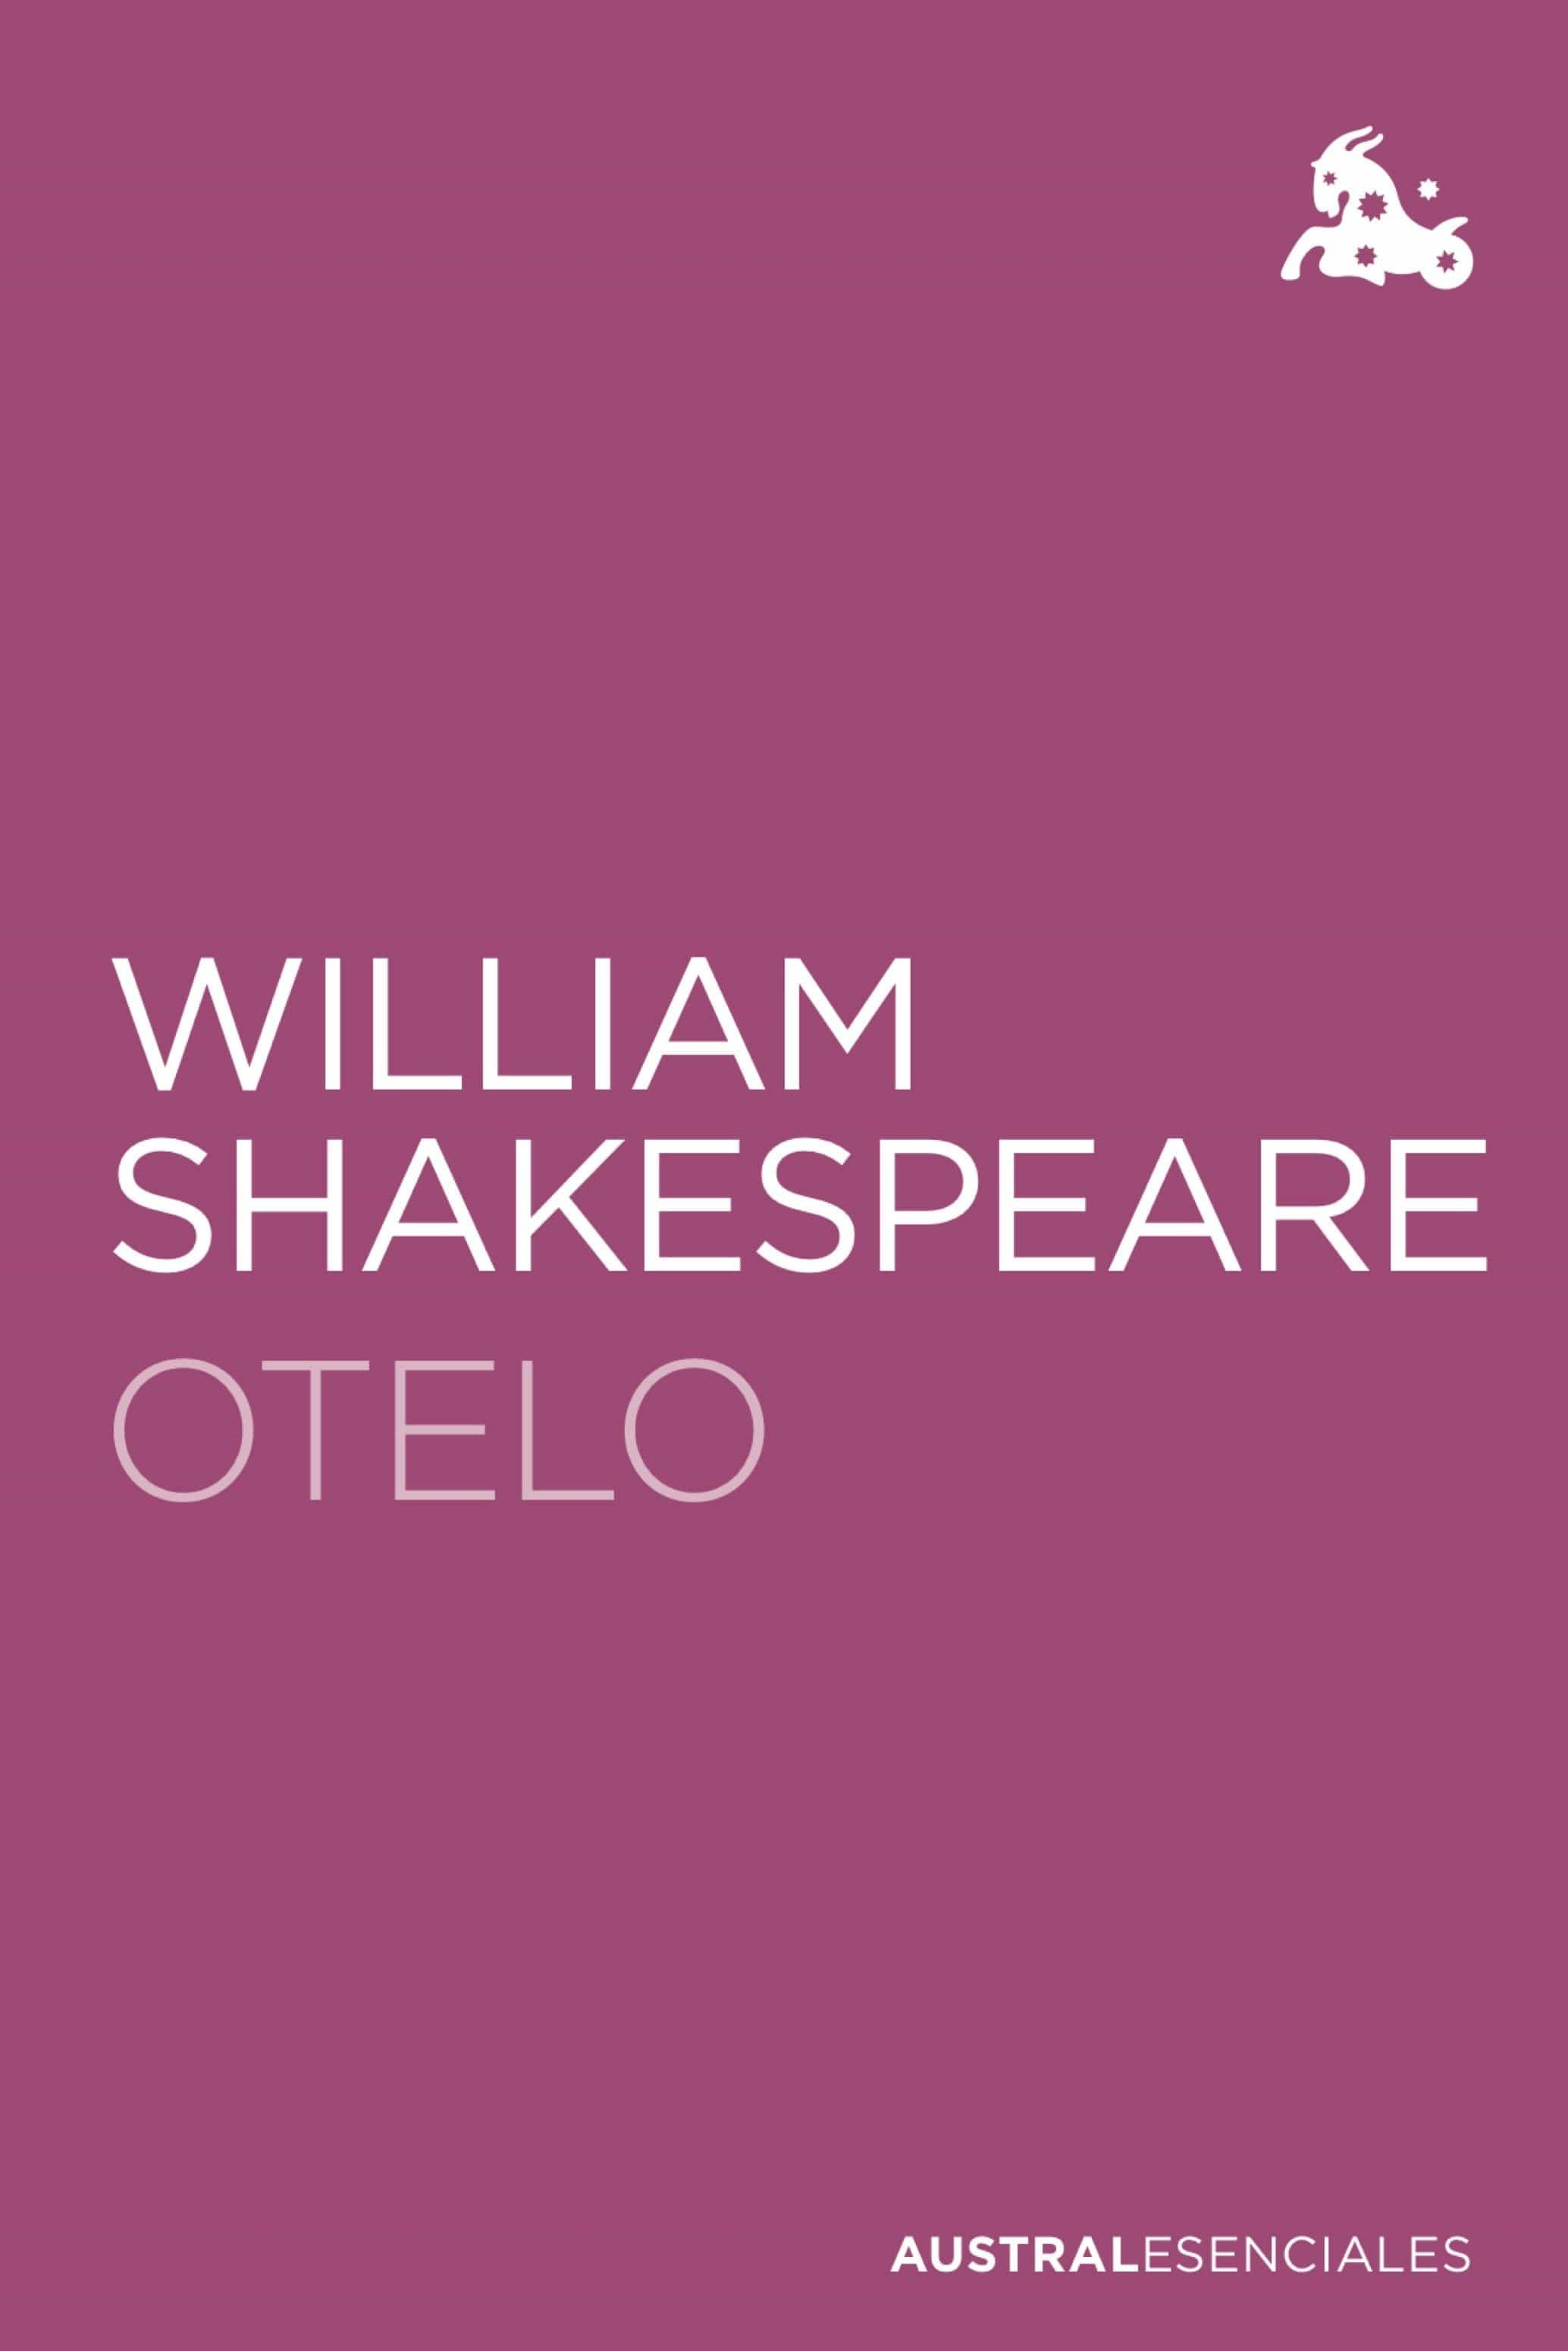 Otelo - Shakespeare William